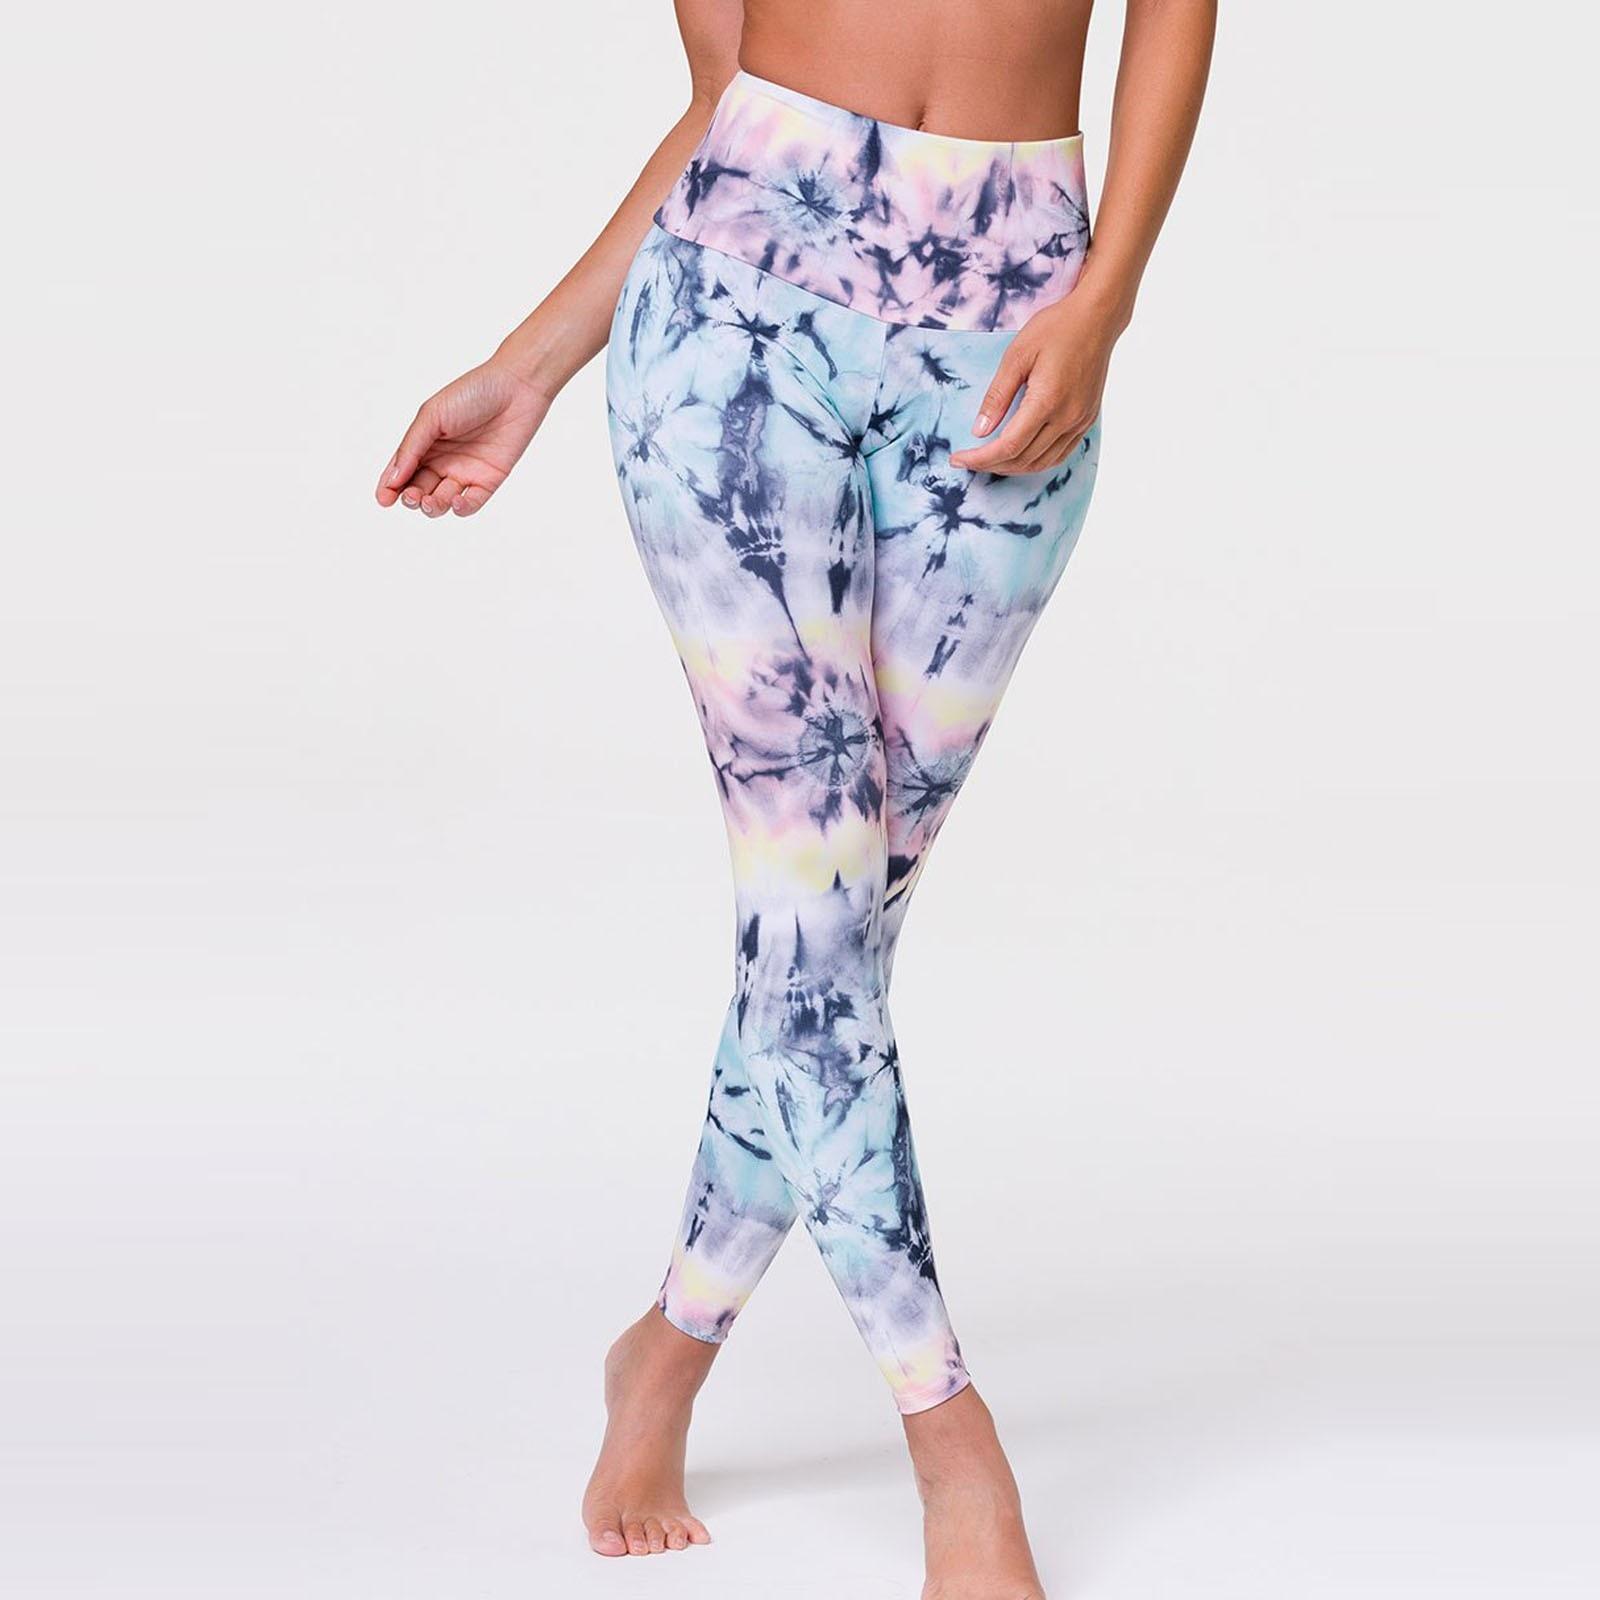 30# Women's Seamless Leggings Sports Training Fitness Tummy Leggins Control Running Printed Legging Workout Pants брюки женские